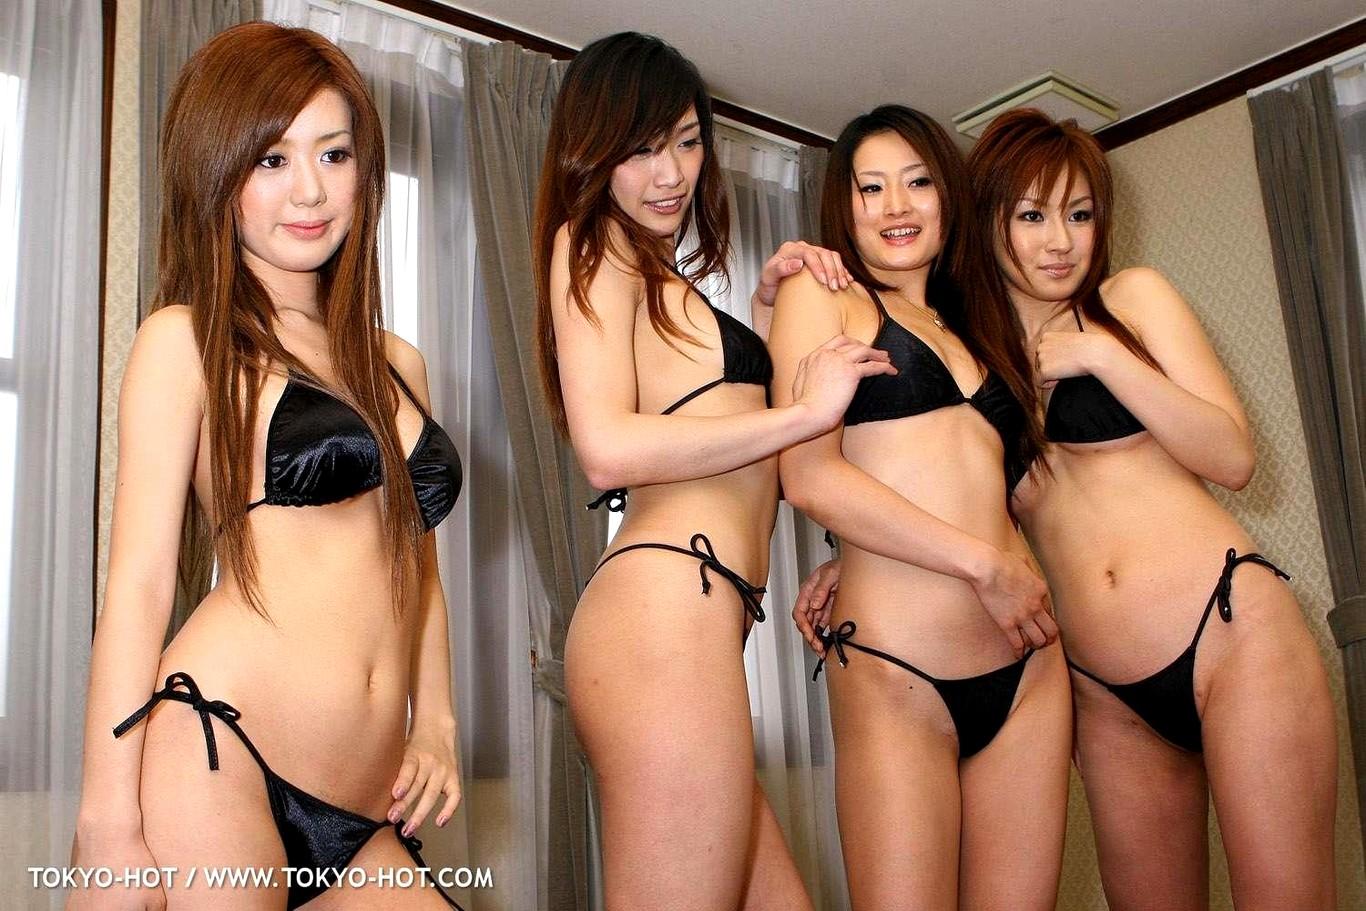 tokyohot 121 ... Tokyohot Model jpg 6 ...